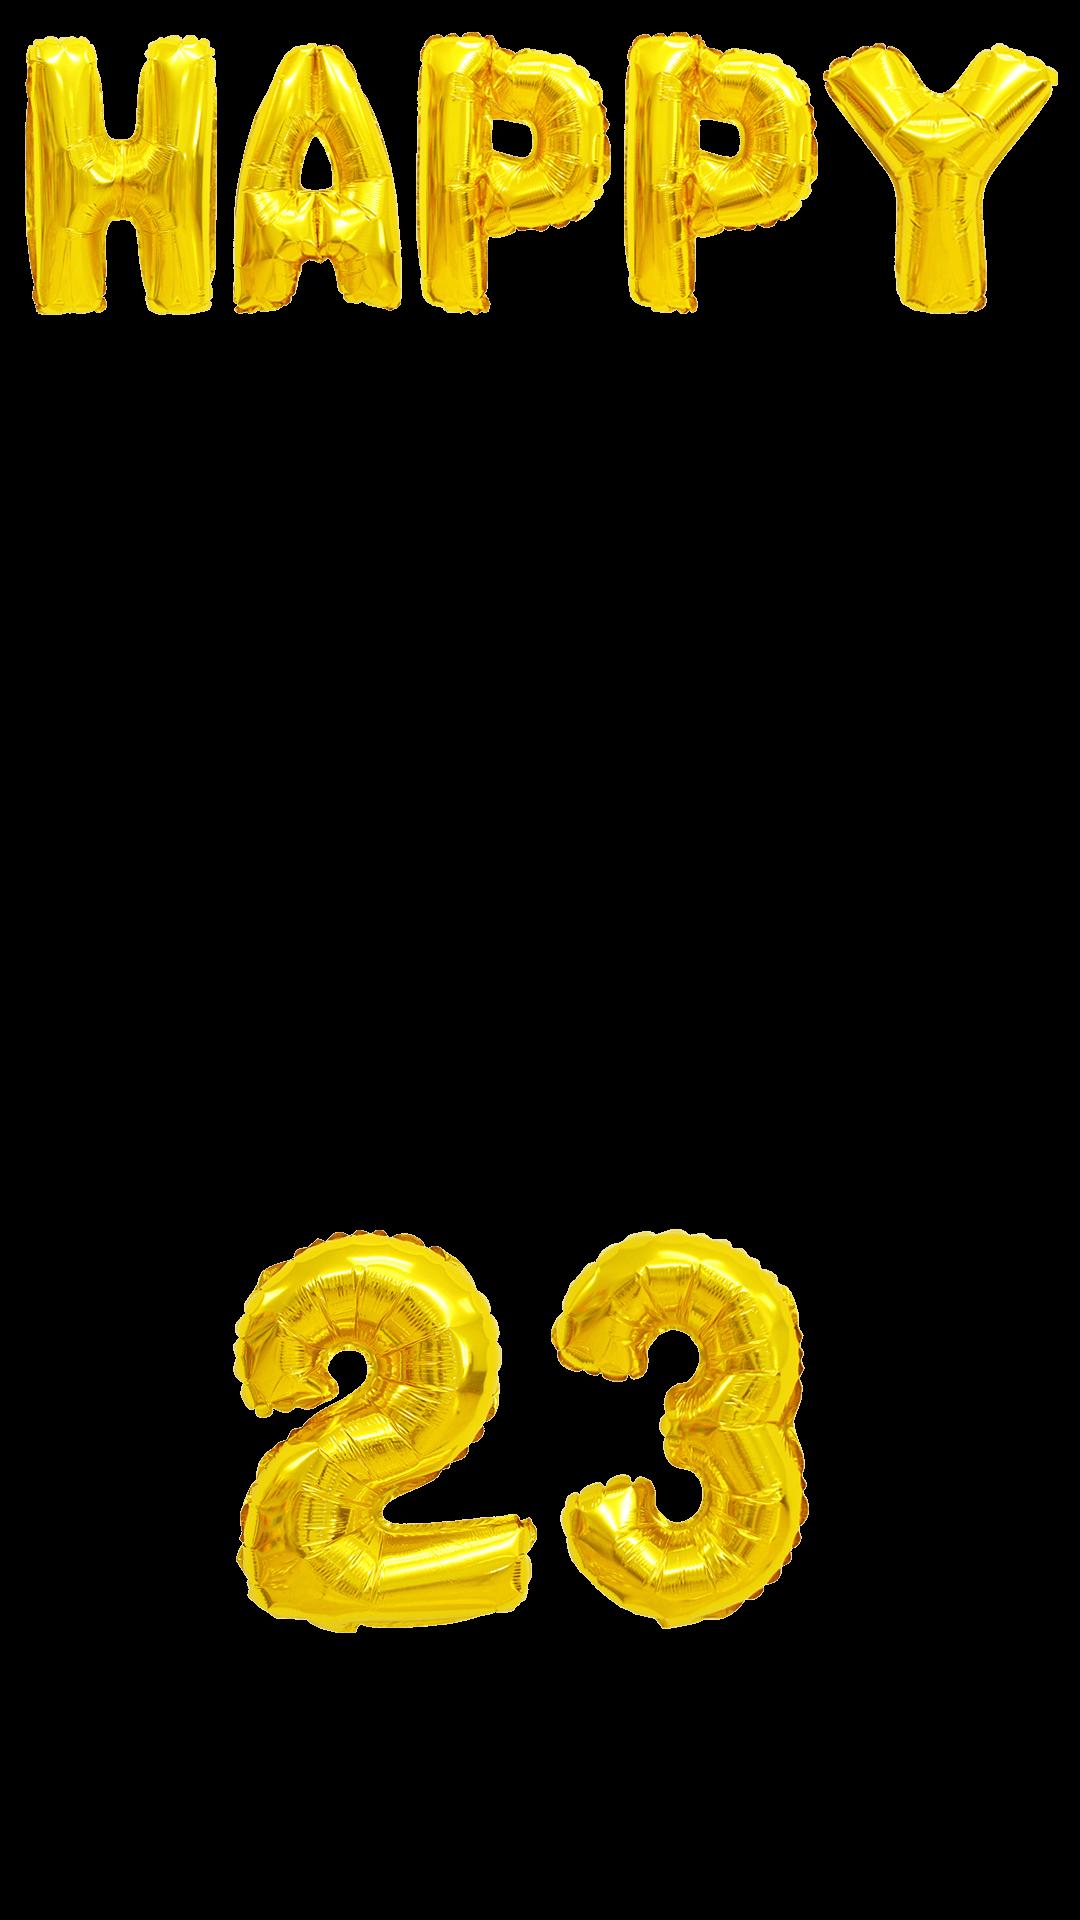 Gold Balloons 23rd Birthday Snapchat Filter